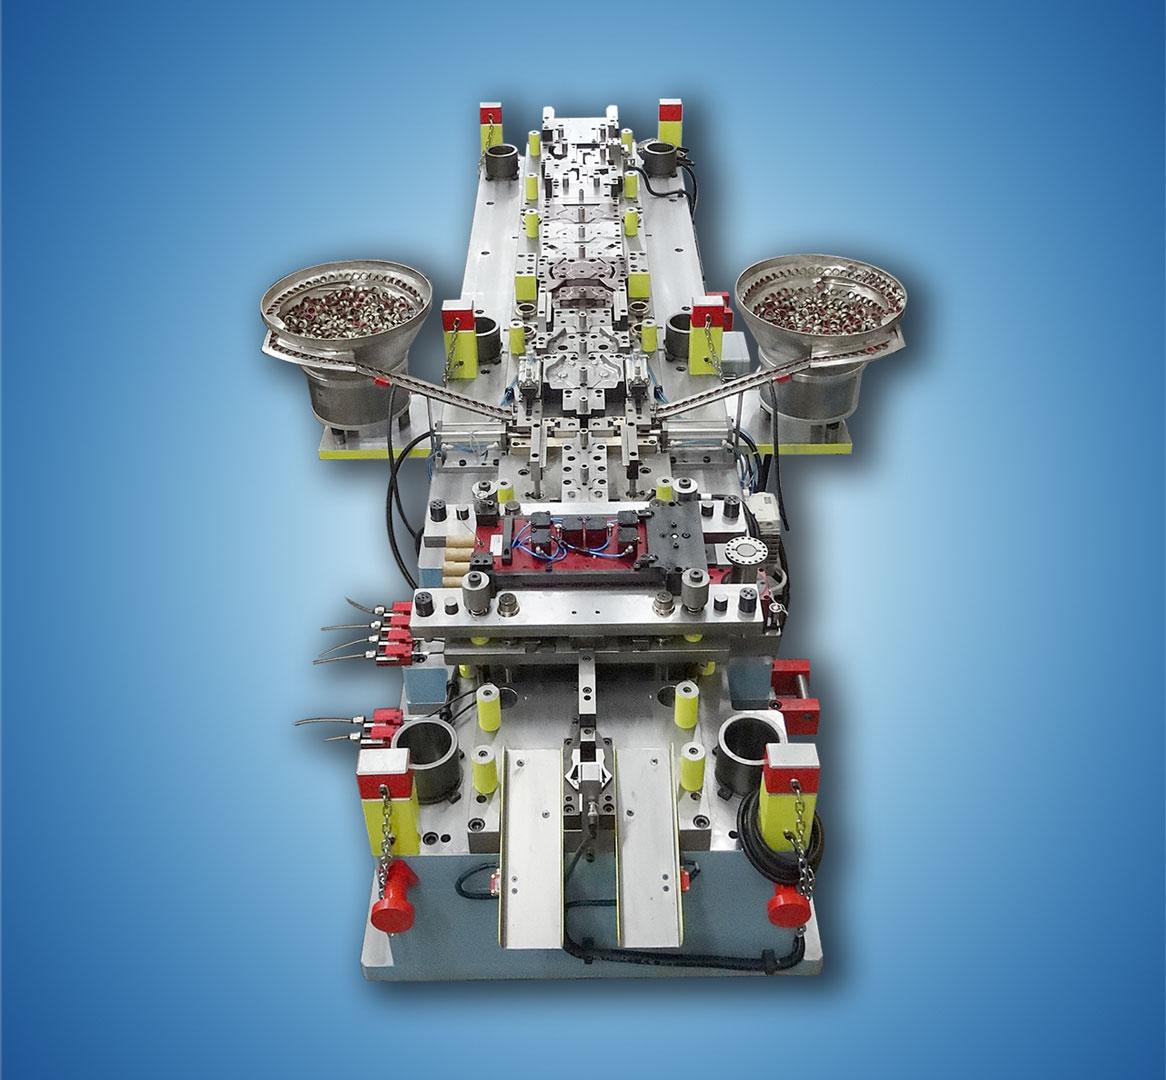 Ero-Projekt-d.o.o.-Toolshop-Werkzeugbau-3-Orodje-za-preoblikov--plocevine-_-slika-3